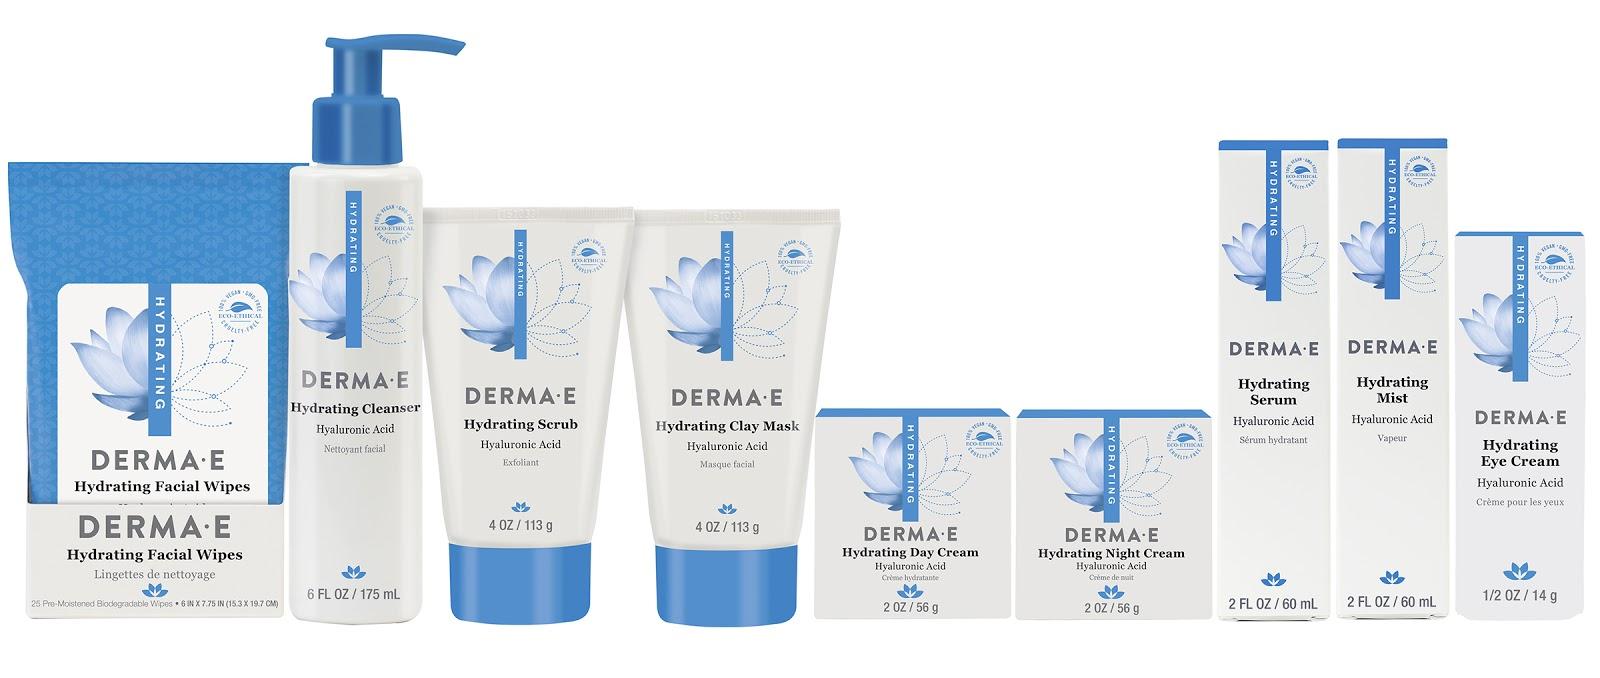 Derma E Very Clear Acne Spot Treatment Each pack Of 3 Fine Workmanship 0.5 Ounce 1